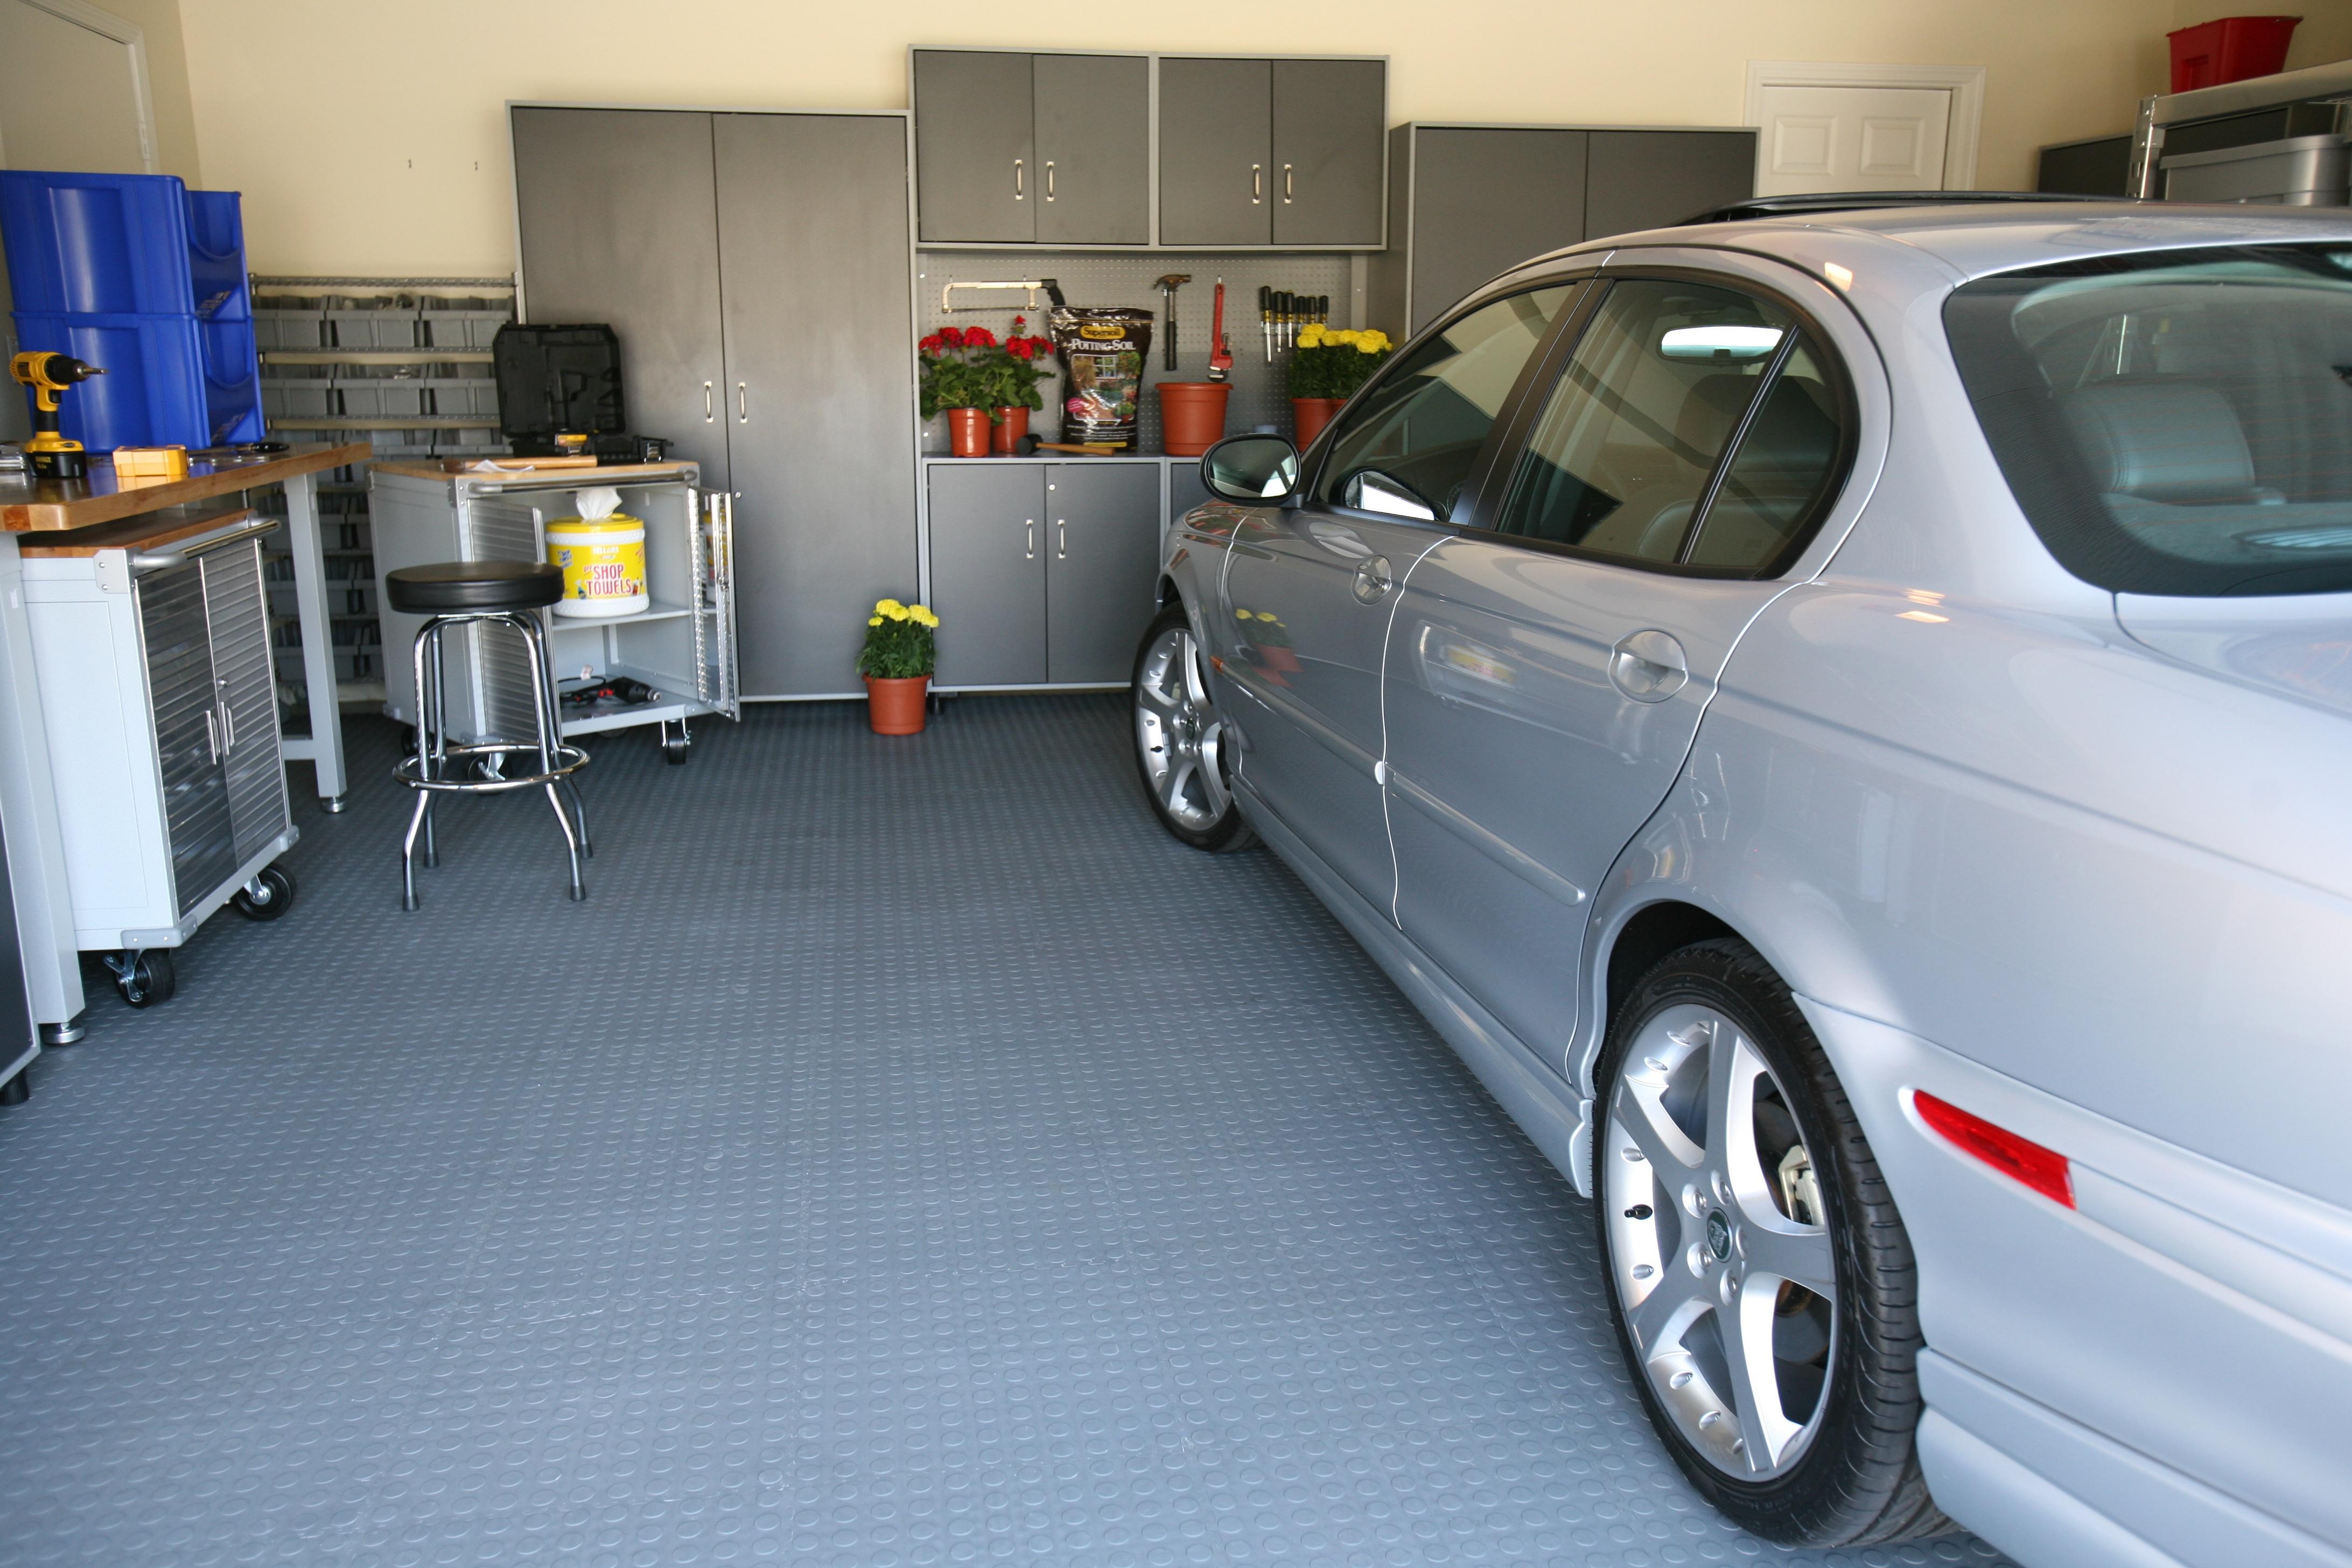 Garage Flooring In Action Garage Floor Tile Installed In A Garage